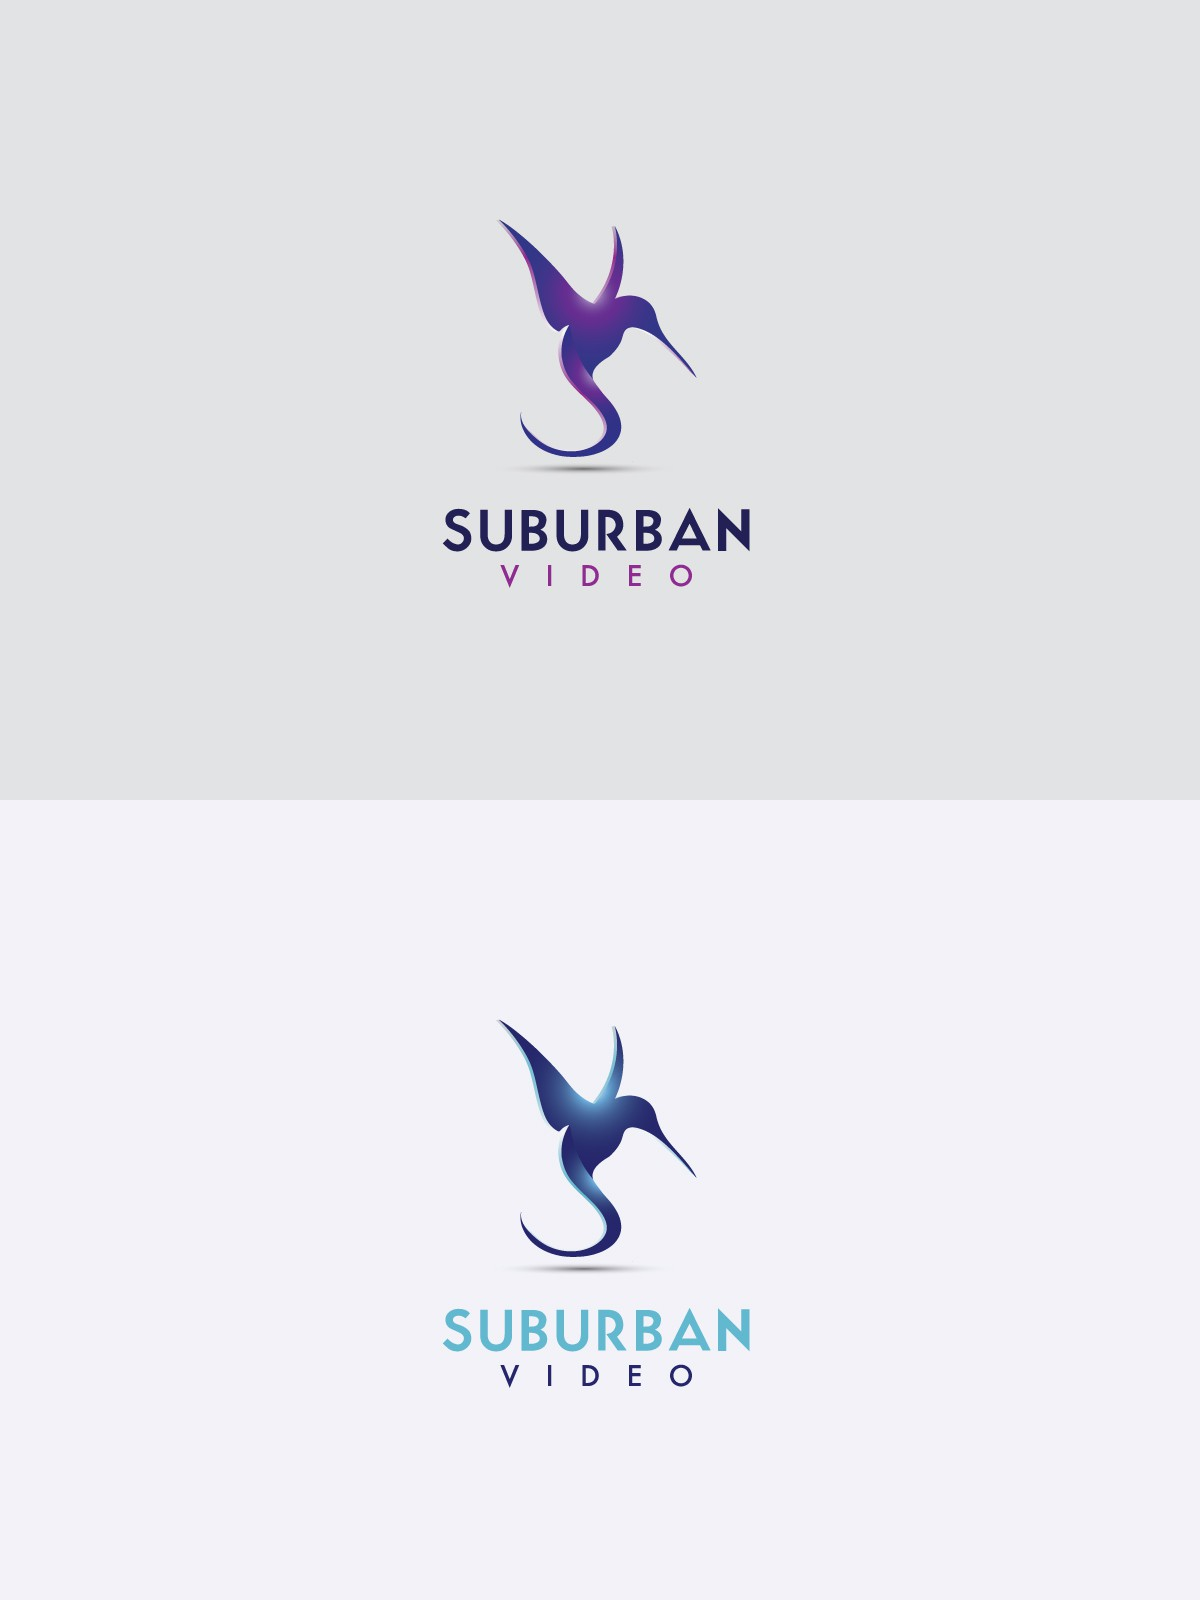 Create the next logo for Suburban Video